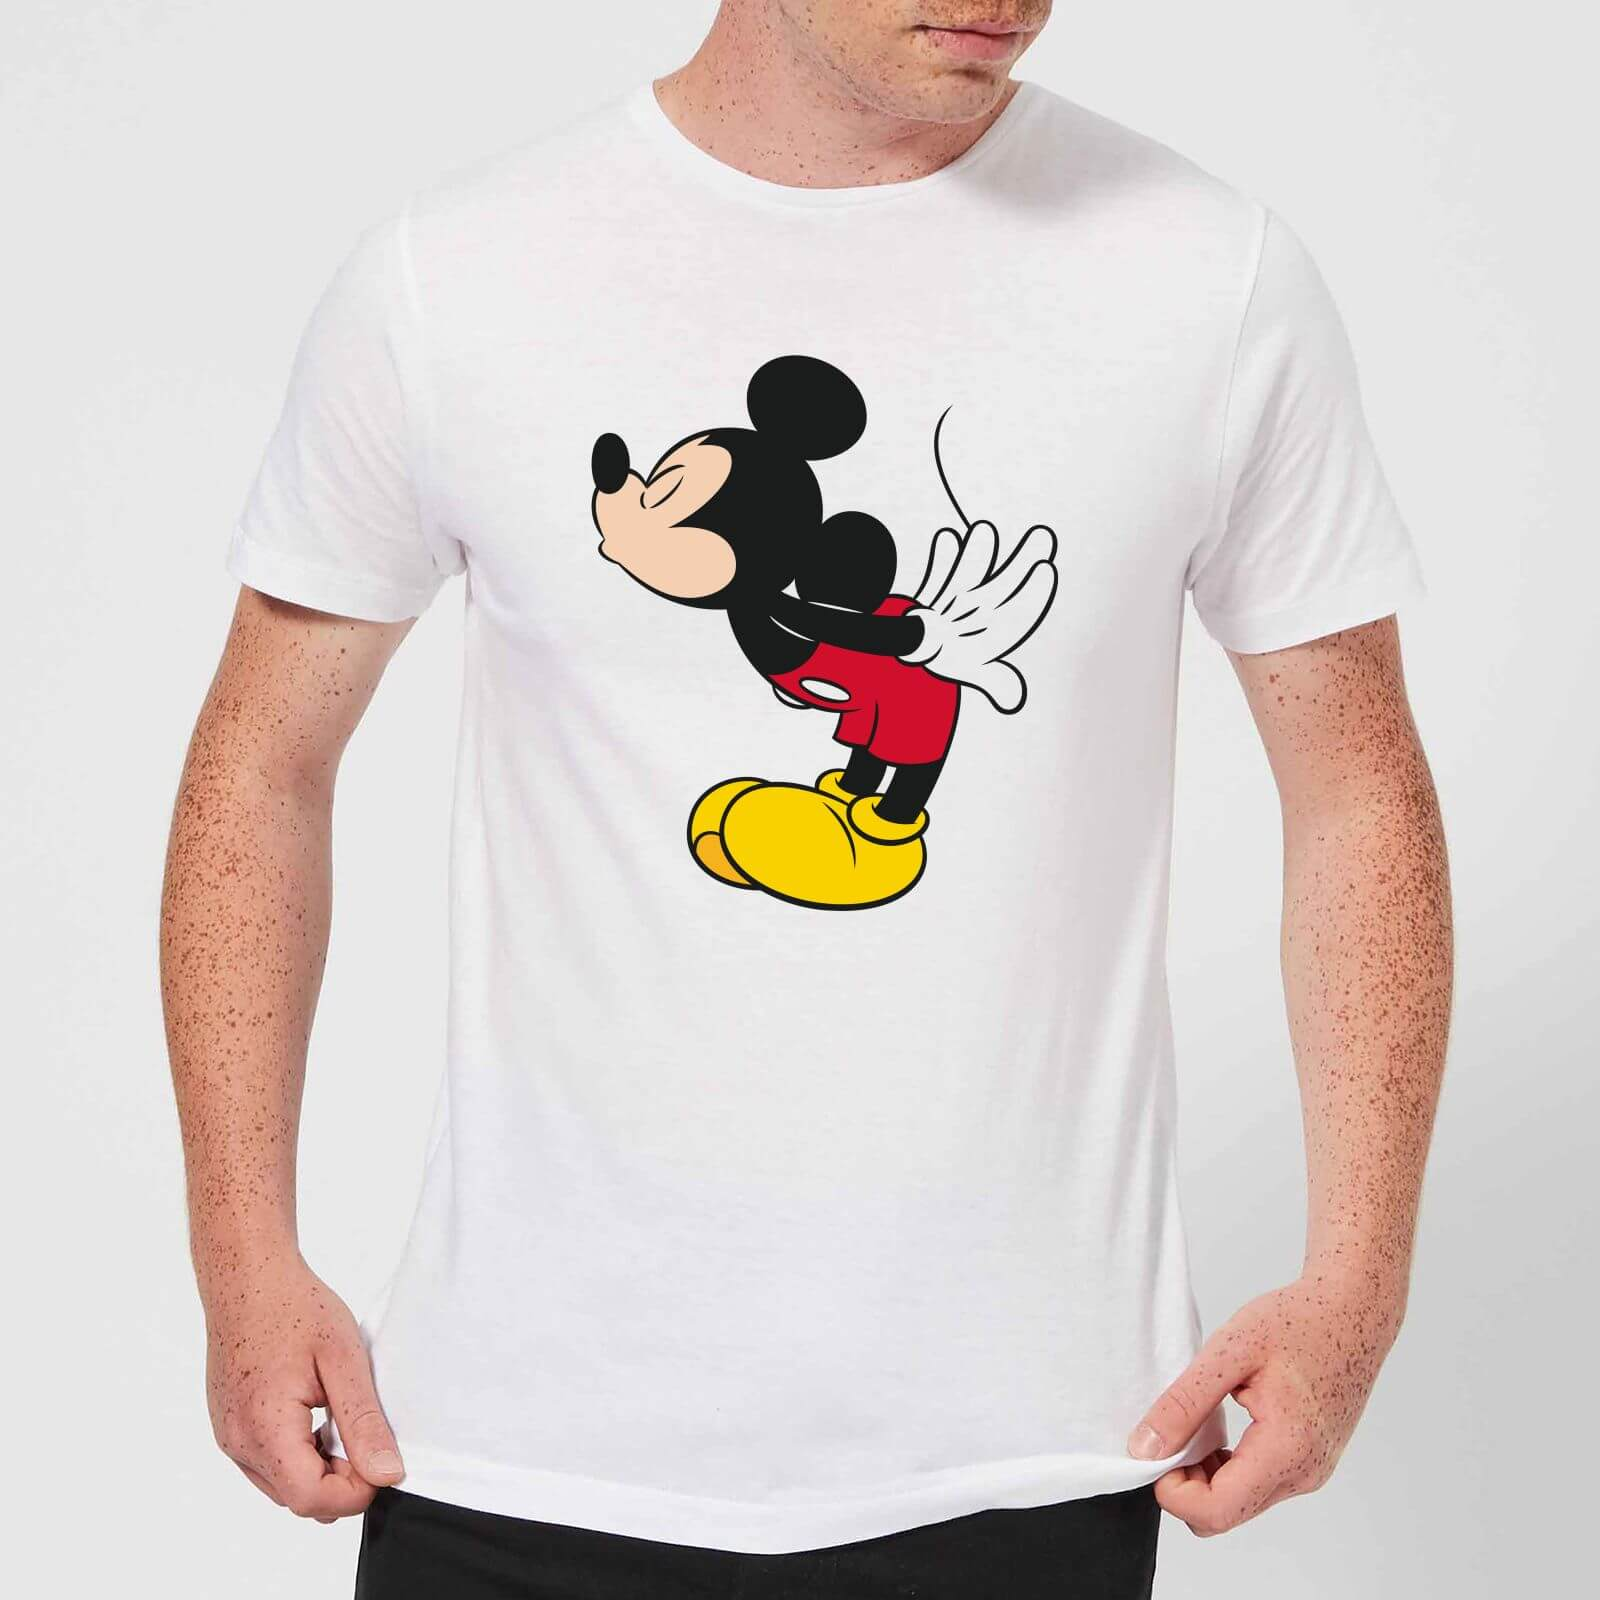 Disney Disney Mickey Mouse Mickey Split Kiss T-Shirt - White - 4XL - White